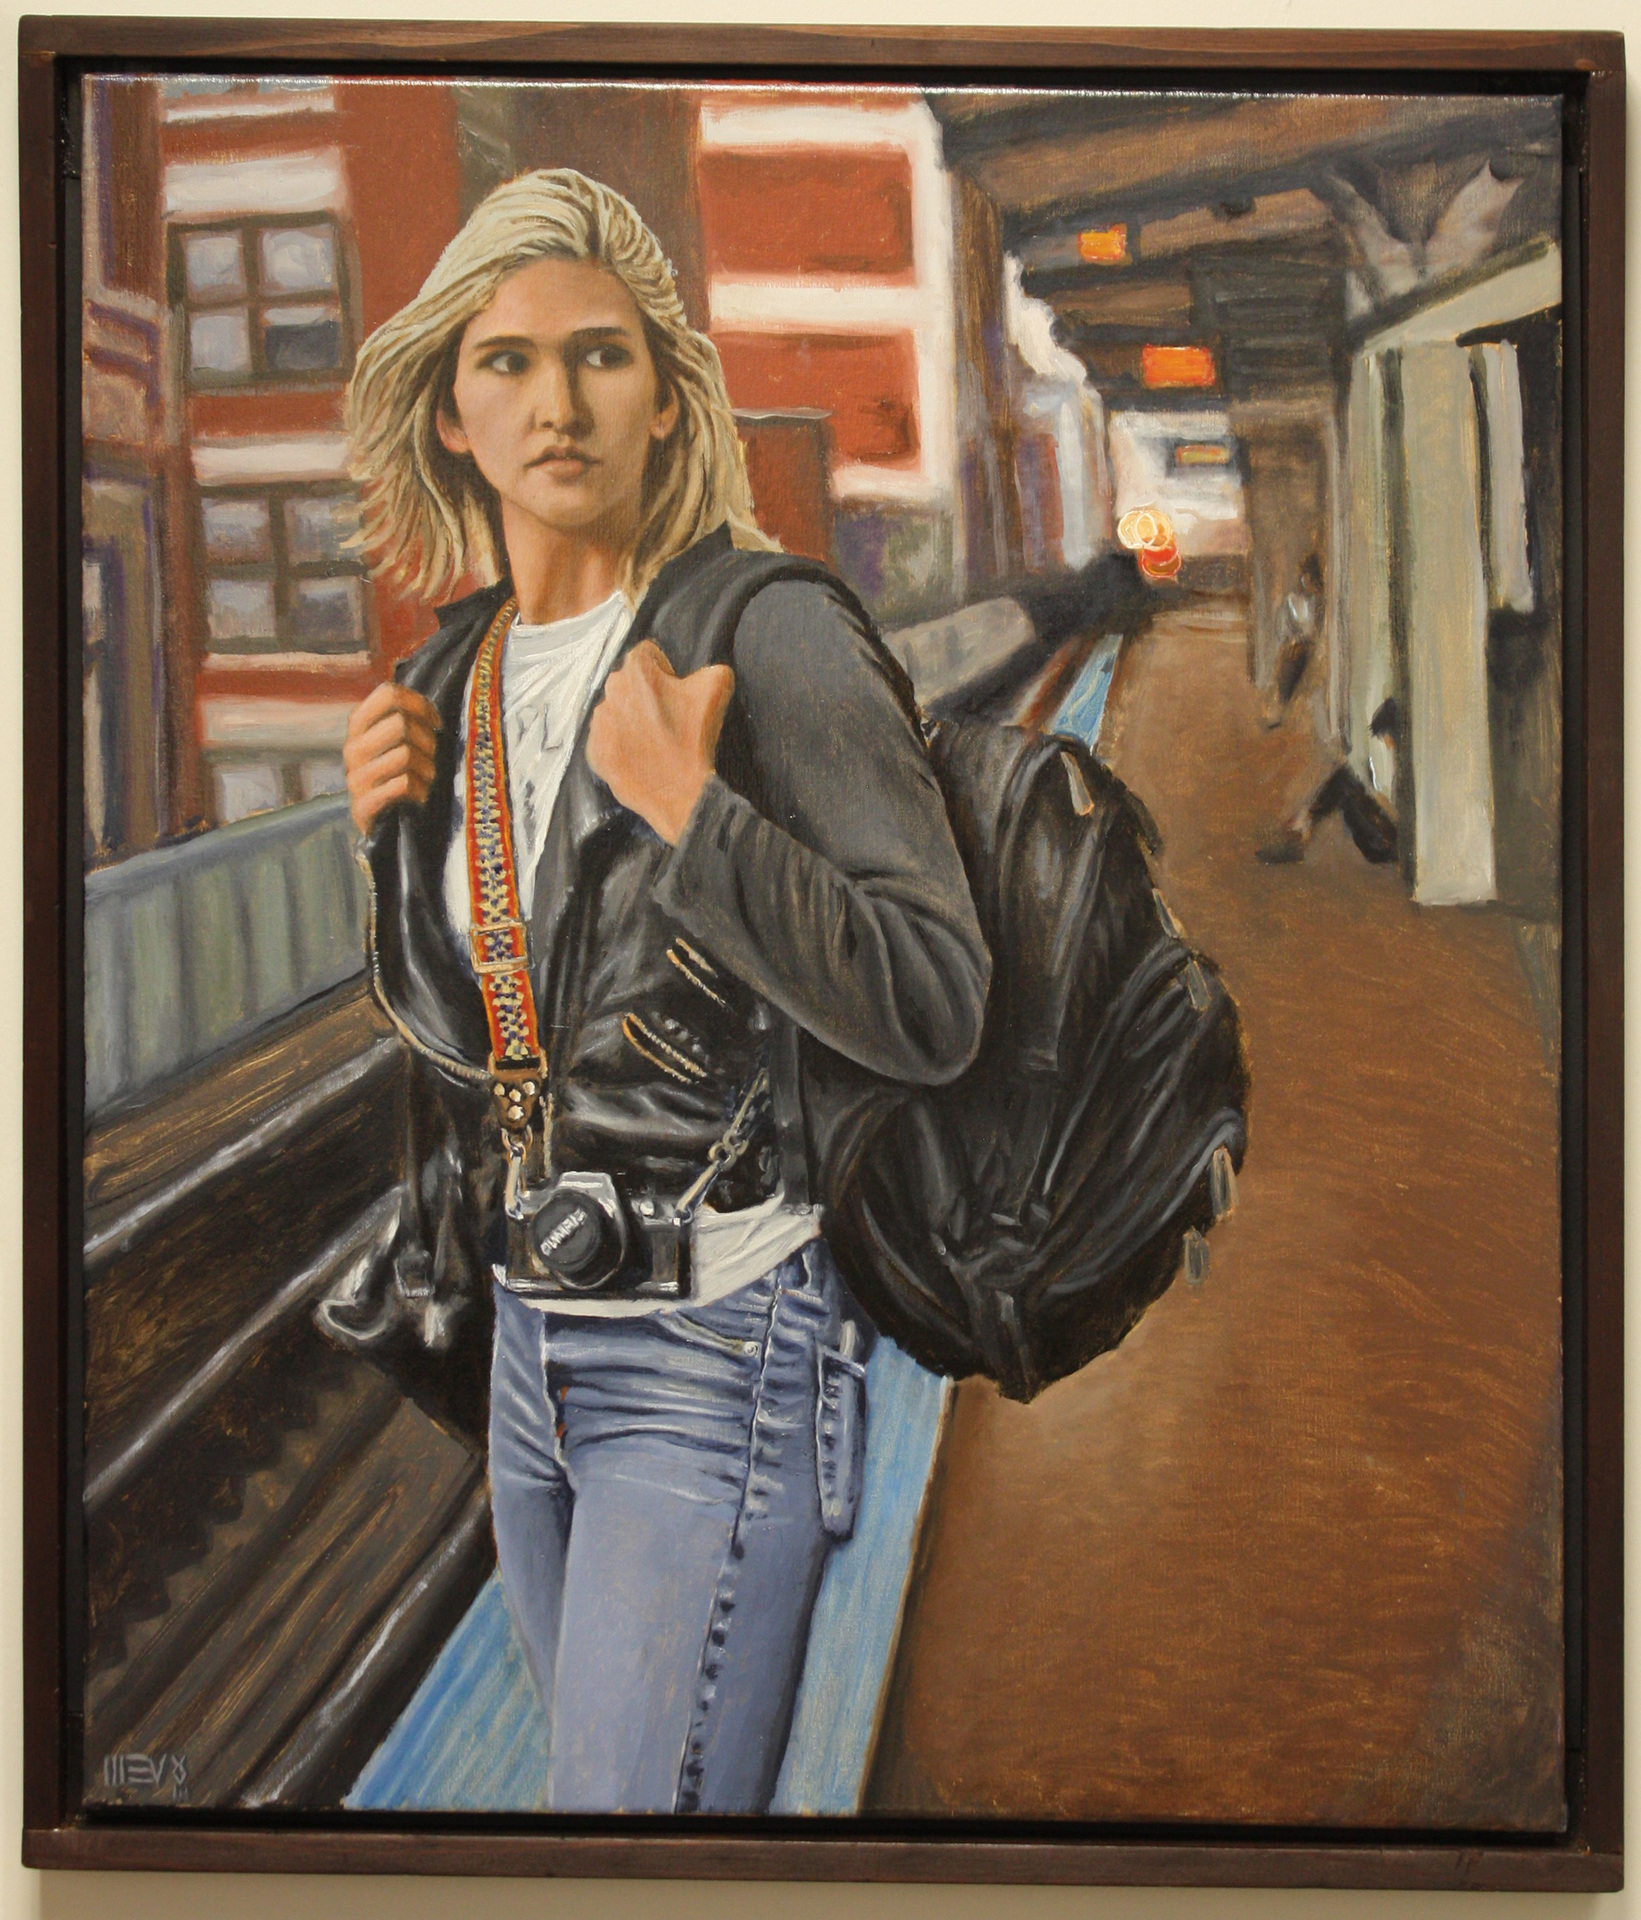 MICHAEL VOSS  - Waukegan, IL   Girl V World   oil on canvas, $2,000